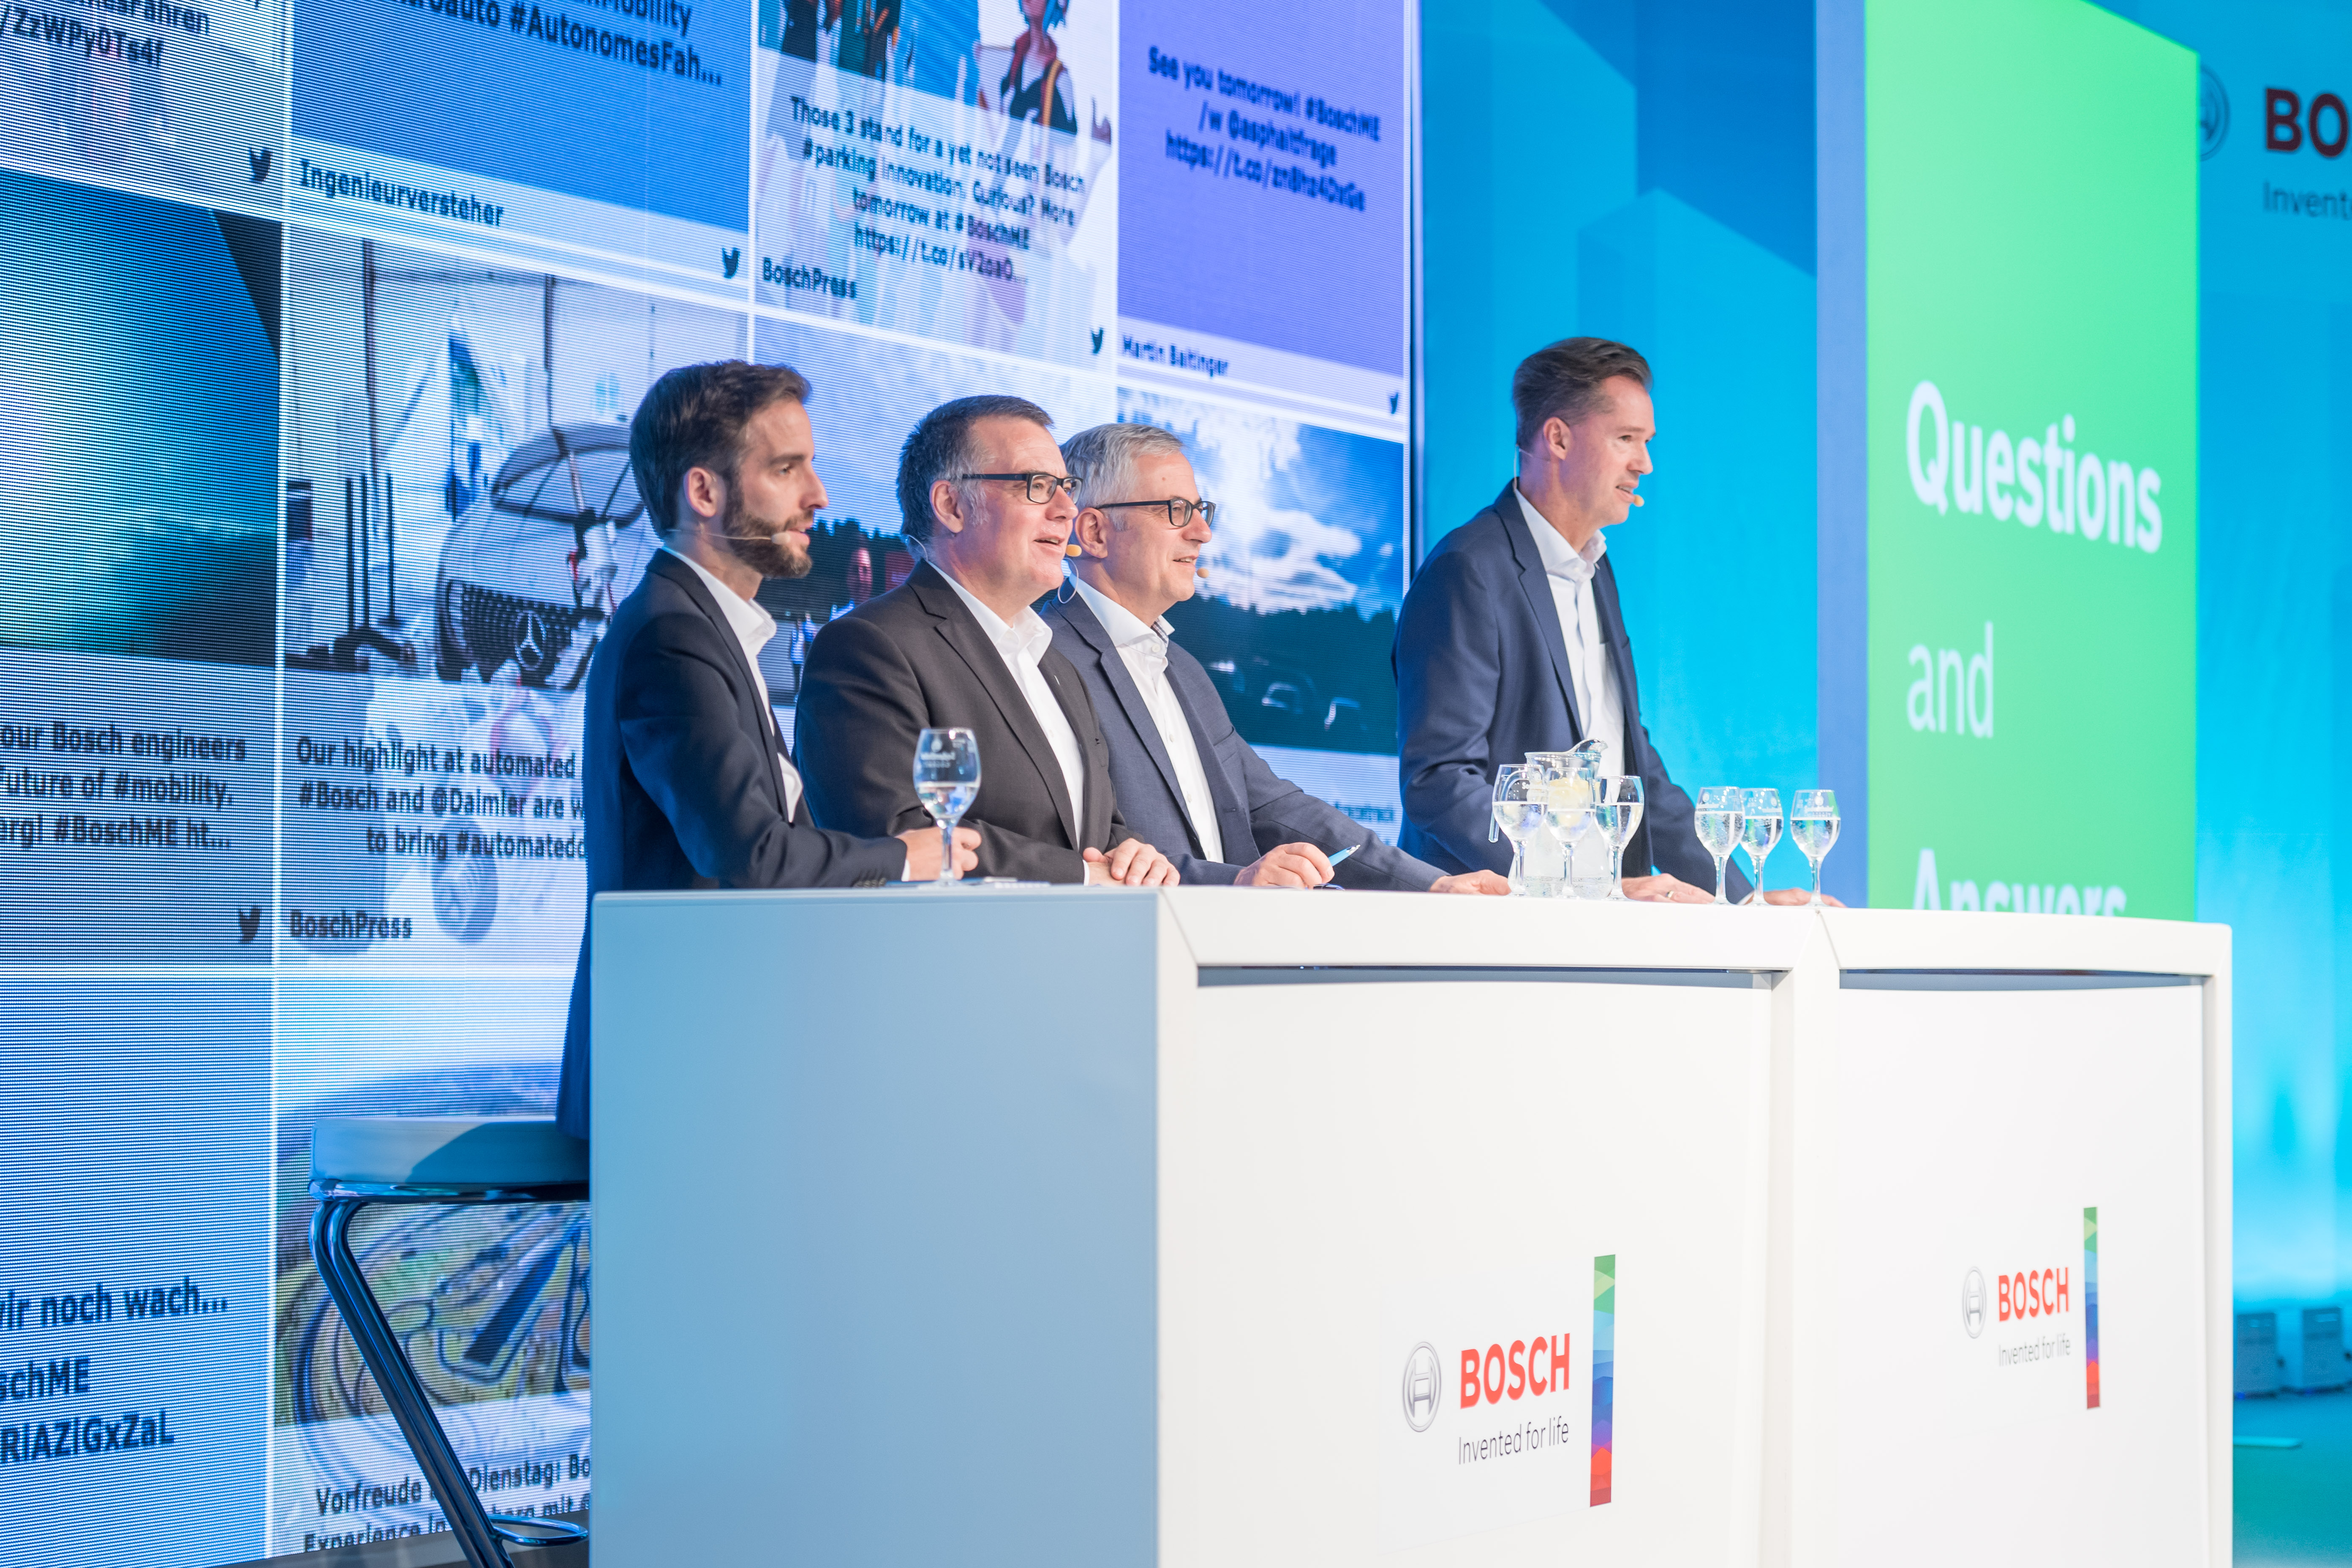 Dr. Rolf Bulander, Dr. Dirk Hoheisel and Dr. Markus Heyn